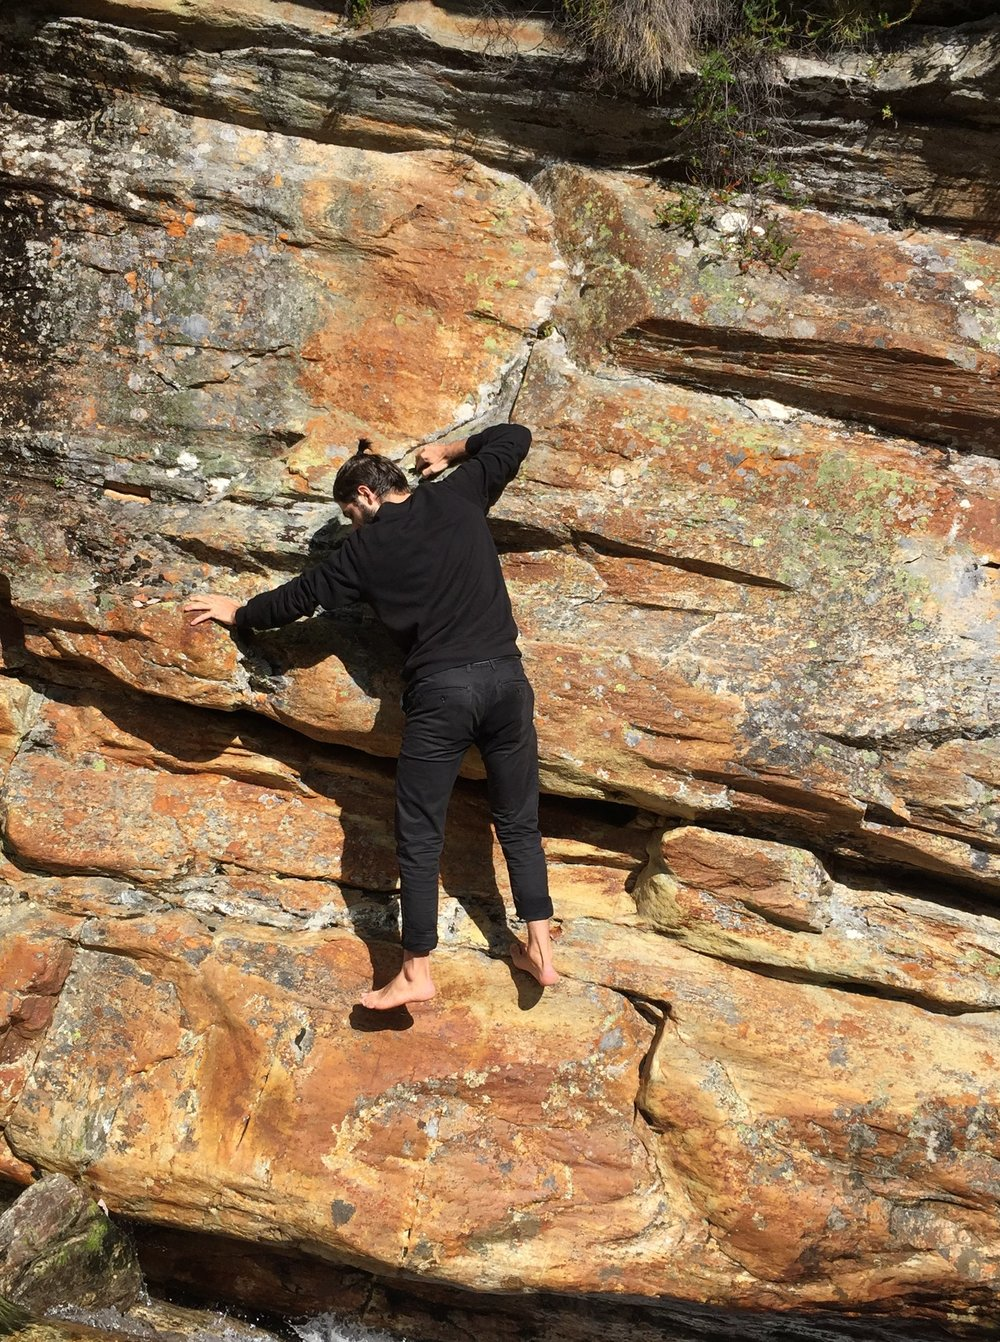 climbing rocks  (photo Jagoda Wiesnewska)